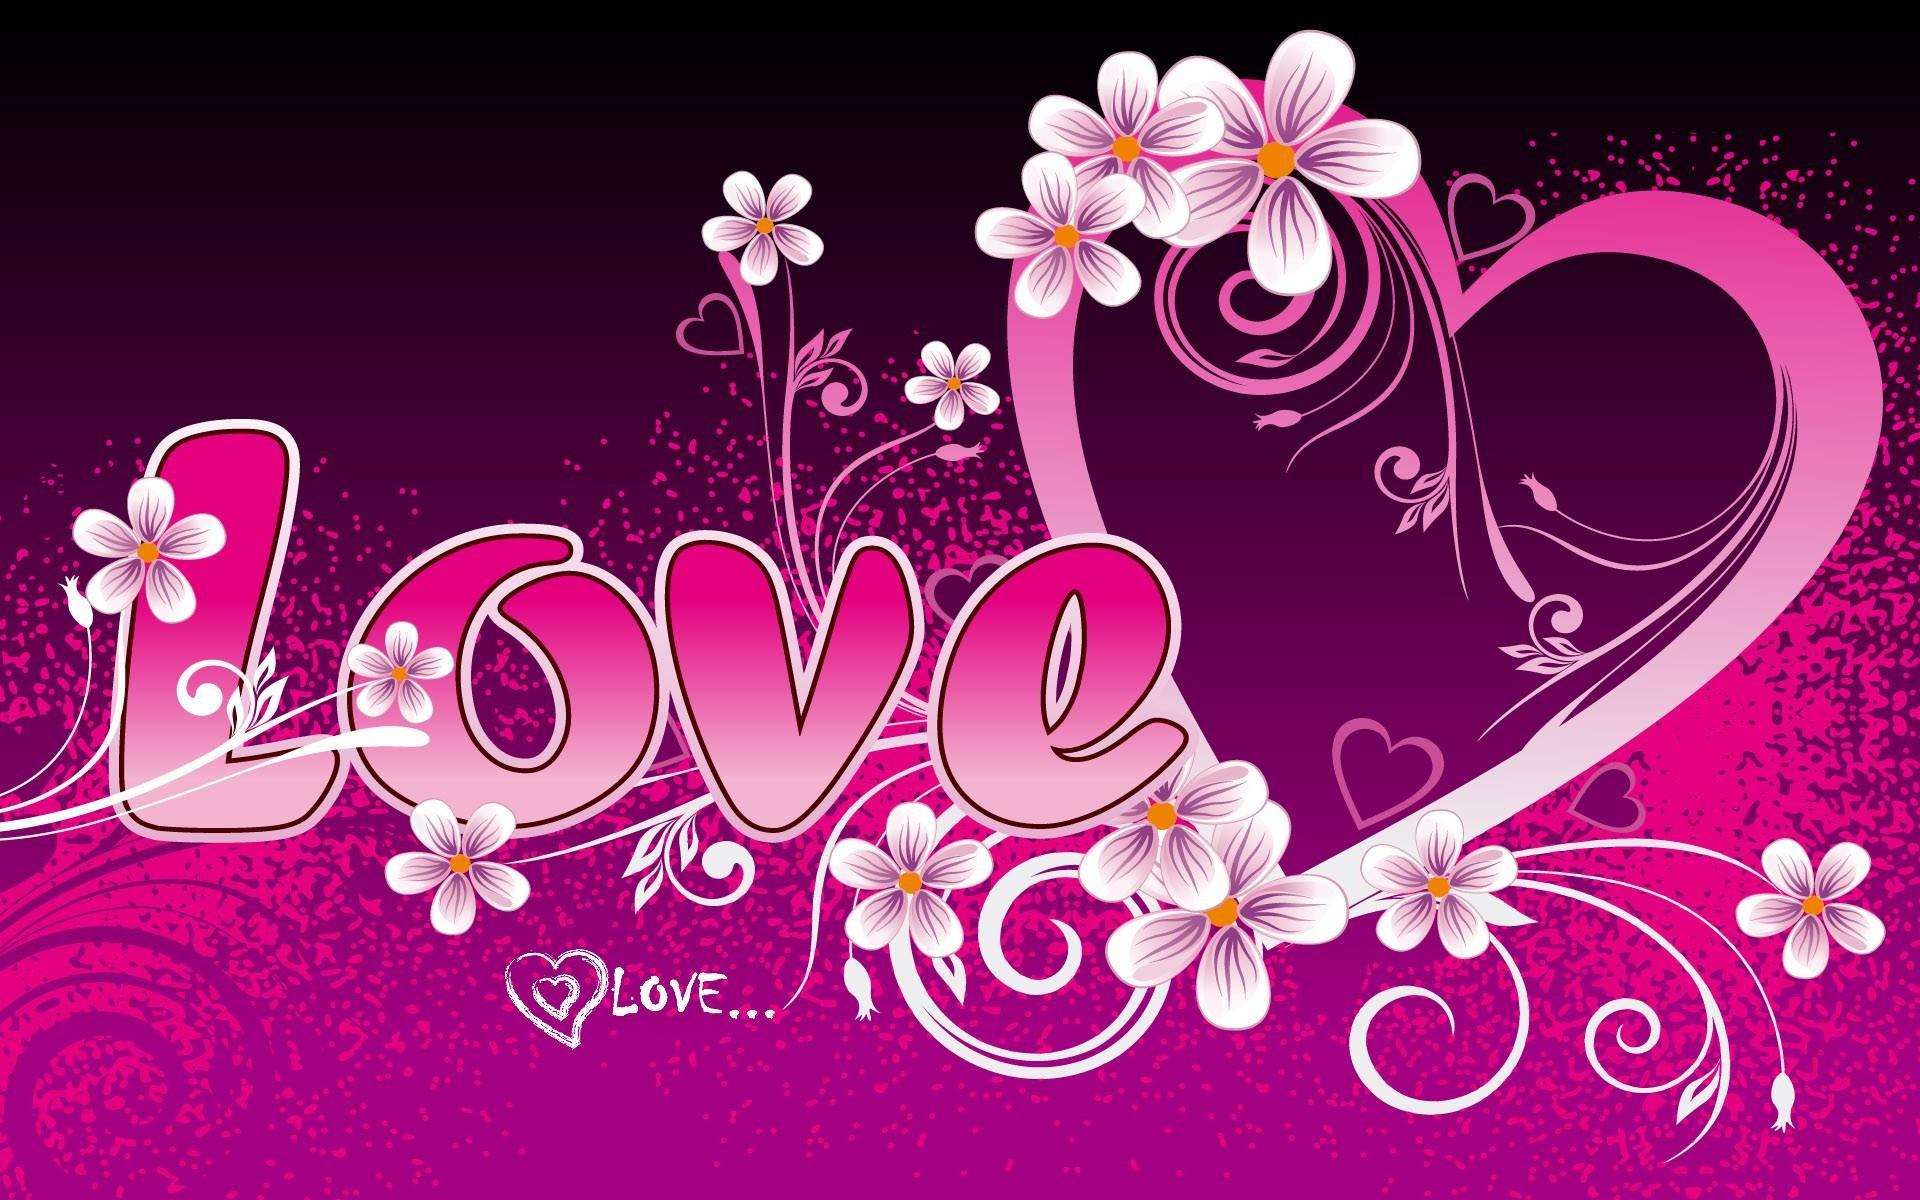 Love Hearts Wallpaper HD Wallpaper – Love Hearts